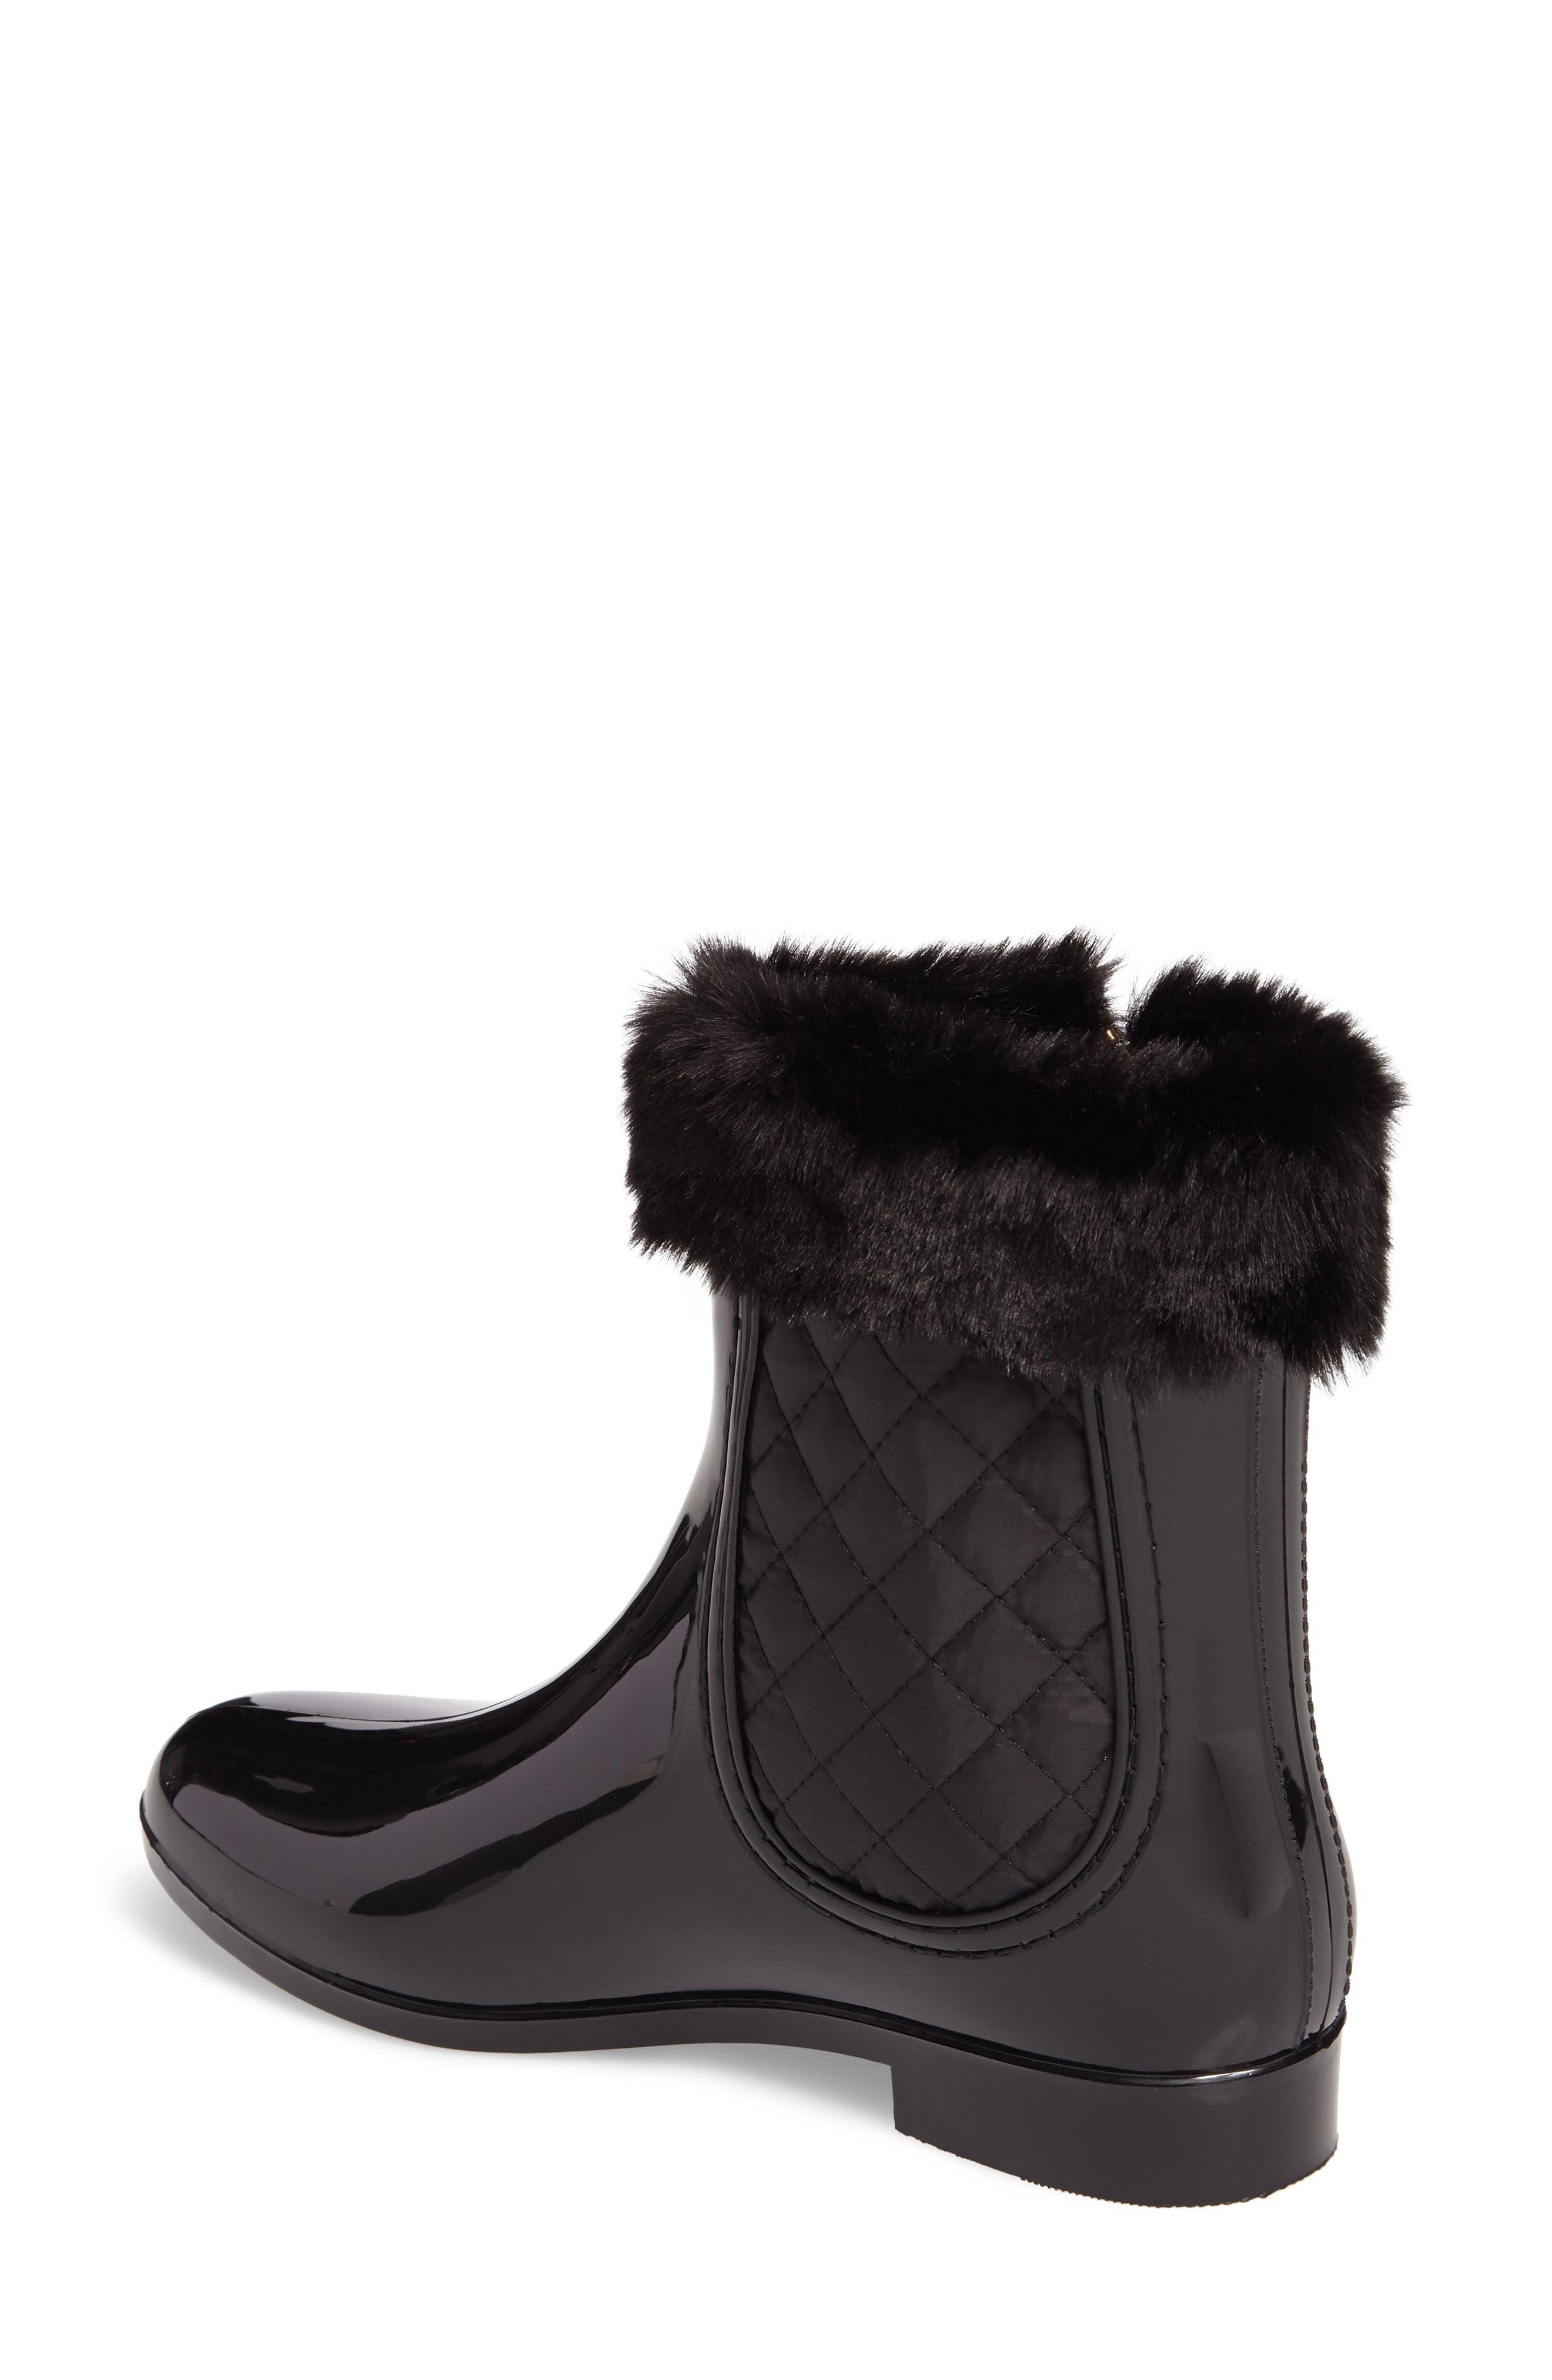 Glasgow Faux Fur Cuff Boot,                             Alternate thumbnail 2, color,                             Black